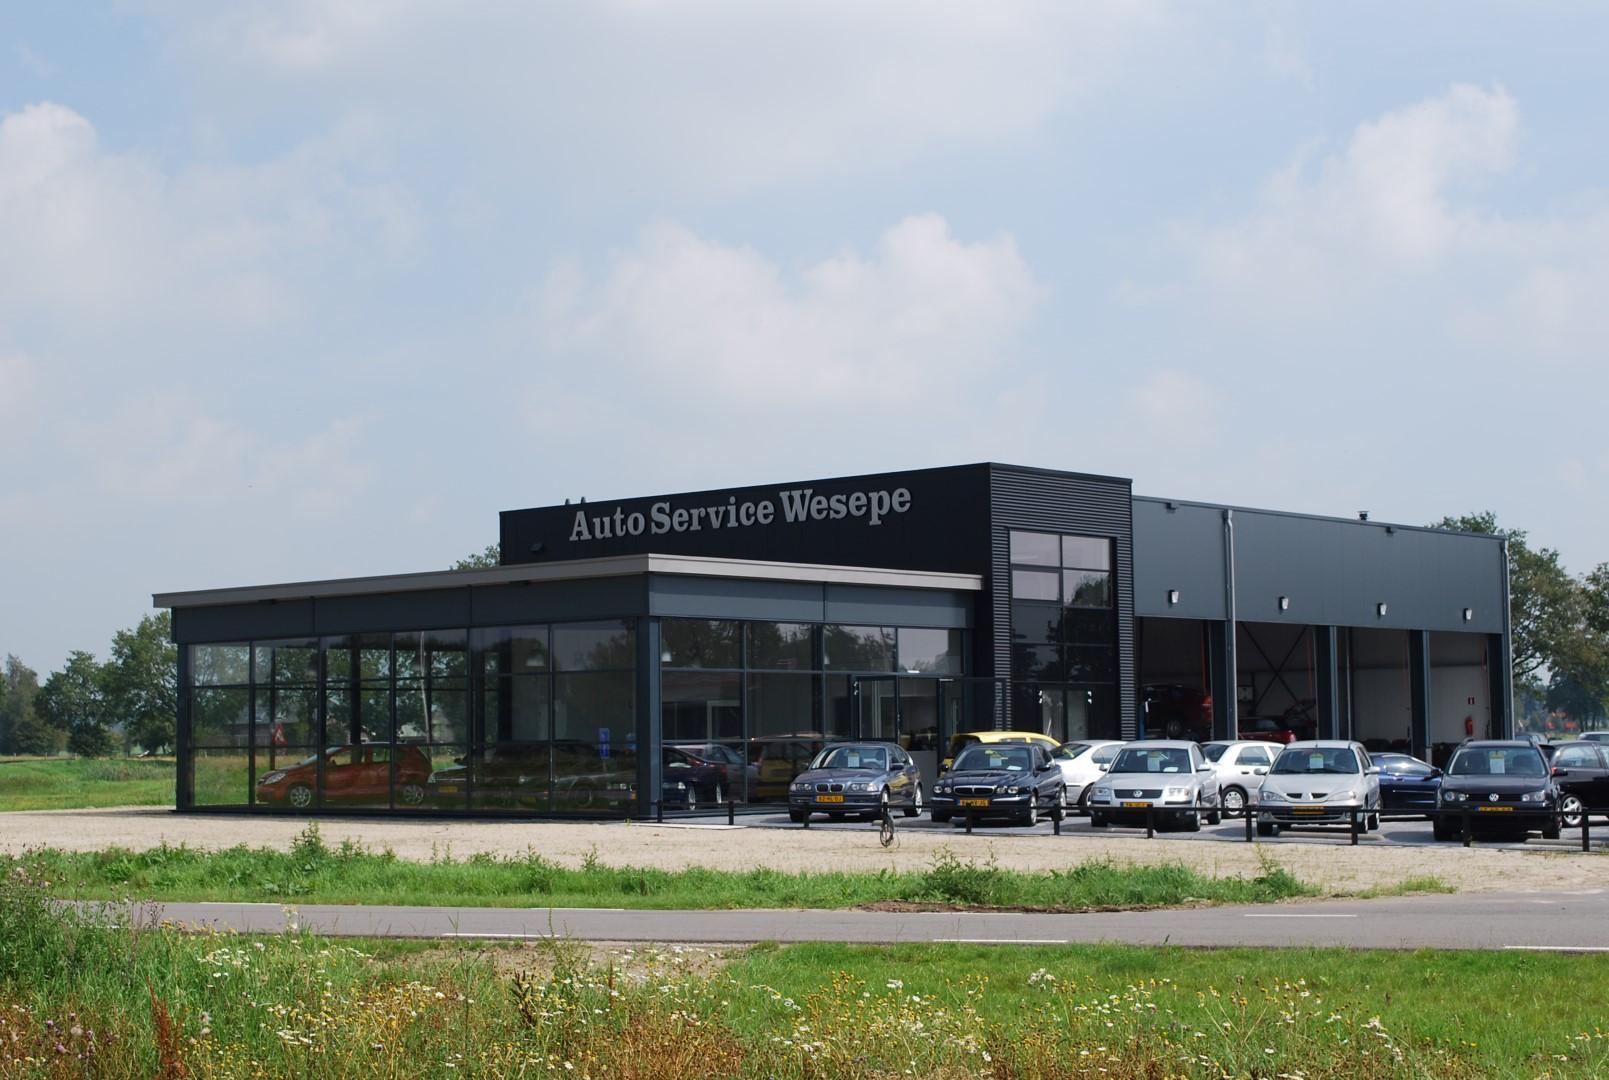 Auto Service Wesepe